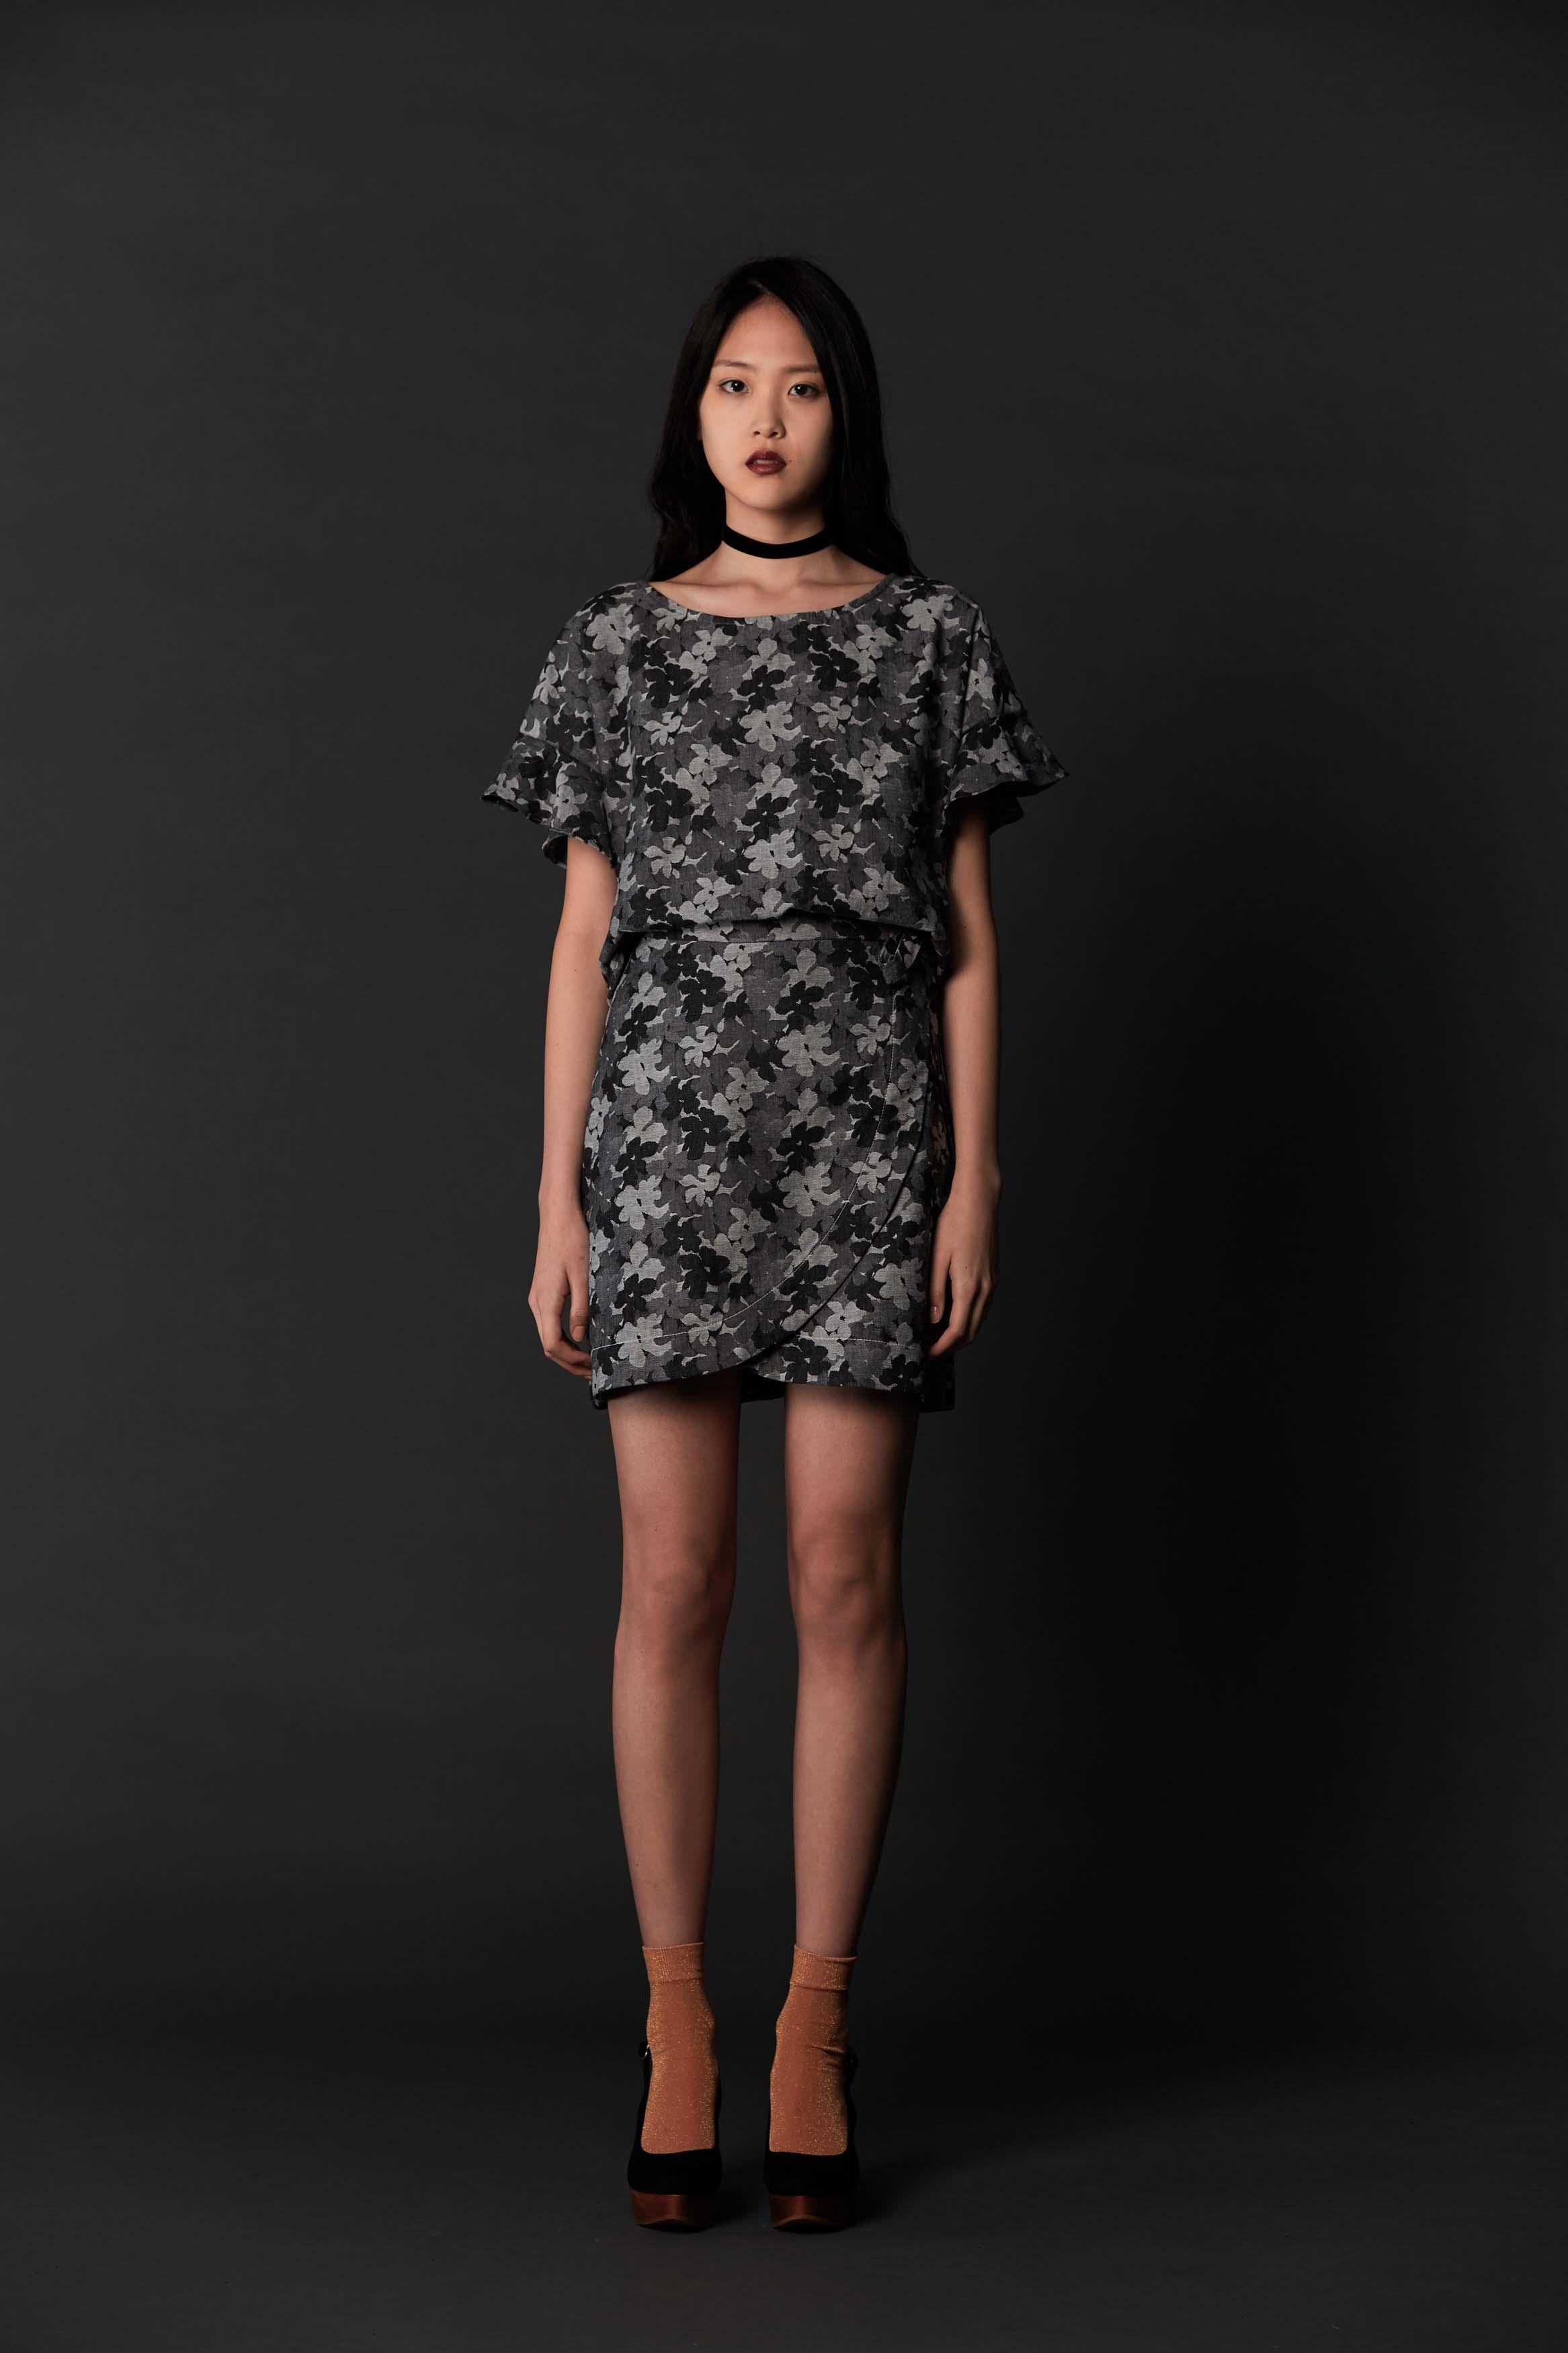 RUBY Mimic Blouse, Mimic Wrap Skirt & Halo Heel